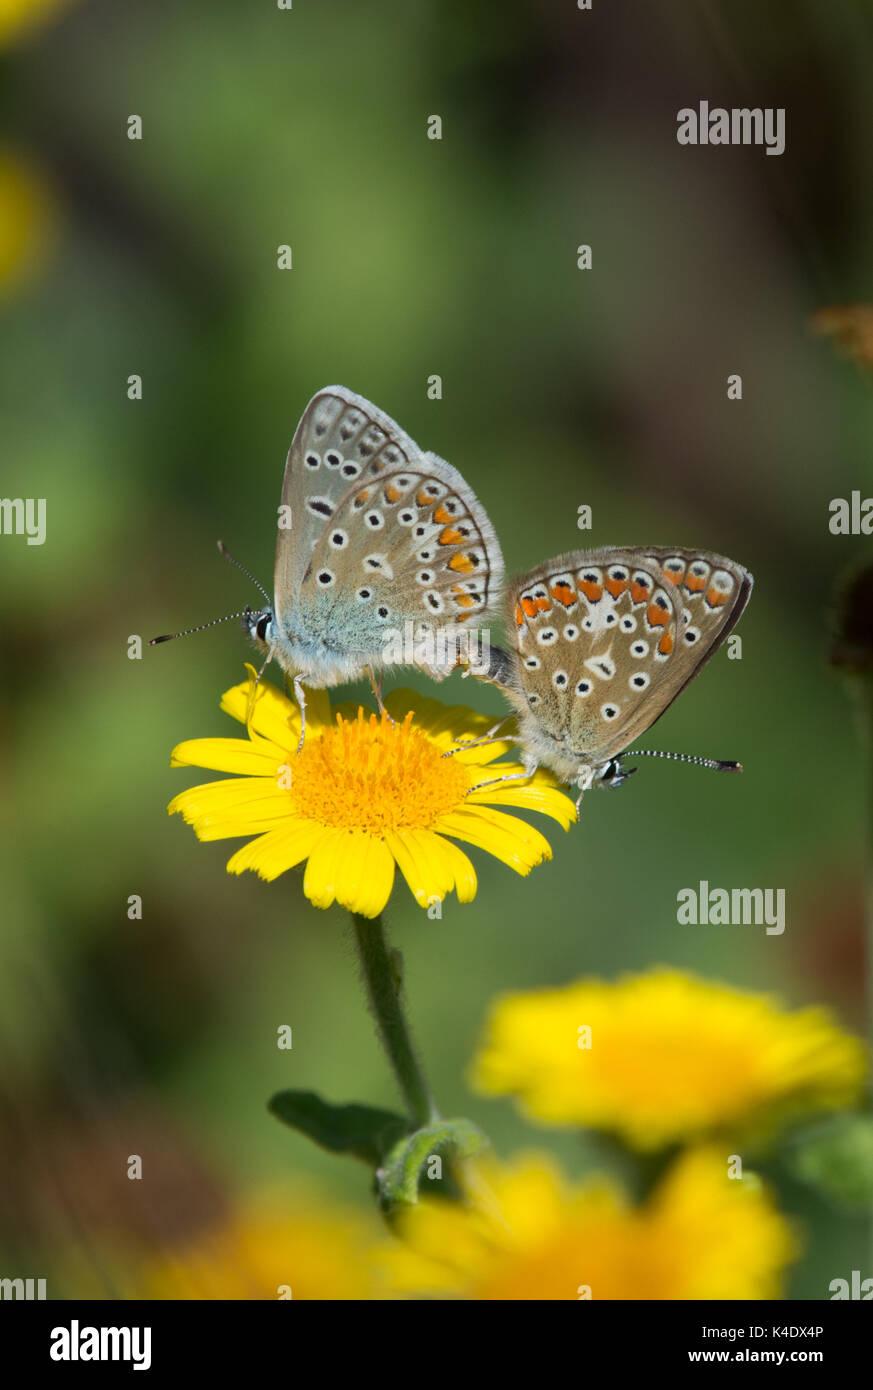 Brown argus (aricia agestis) butterflies mating, on yellow flower, Marais du logit, France - Stock Image